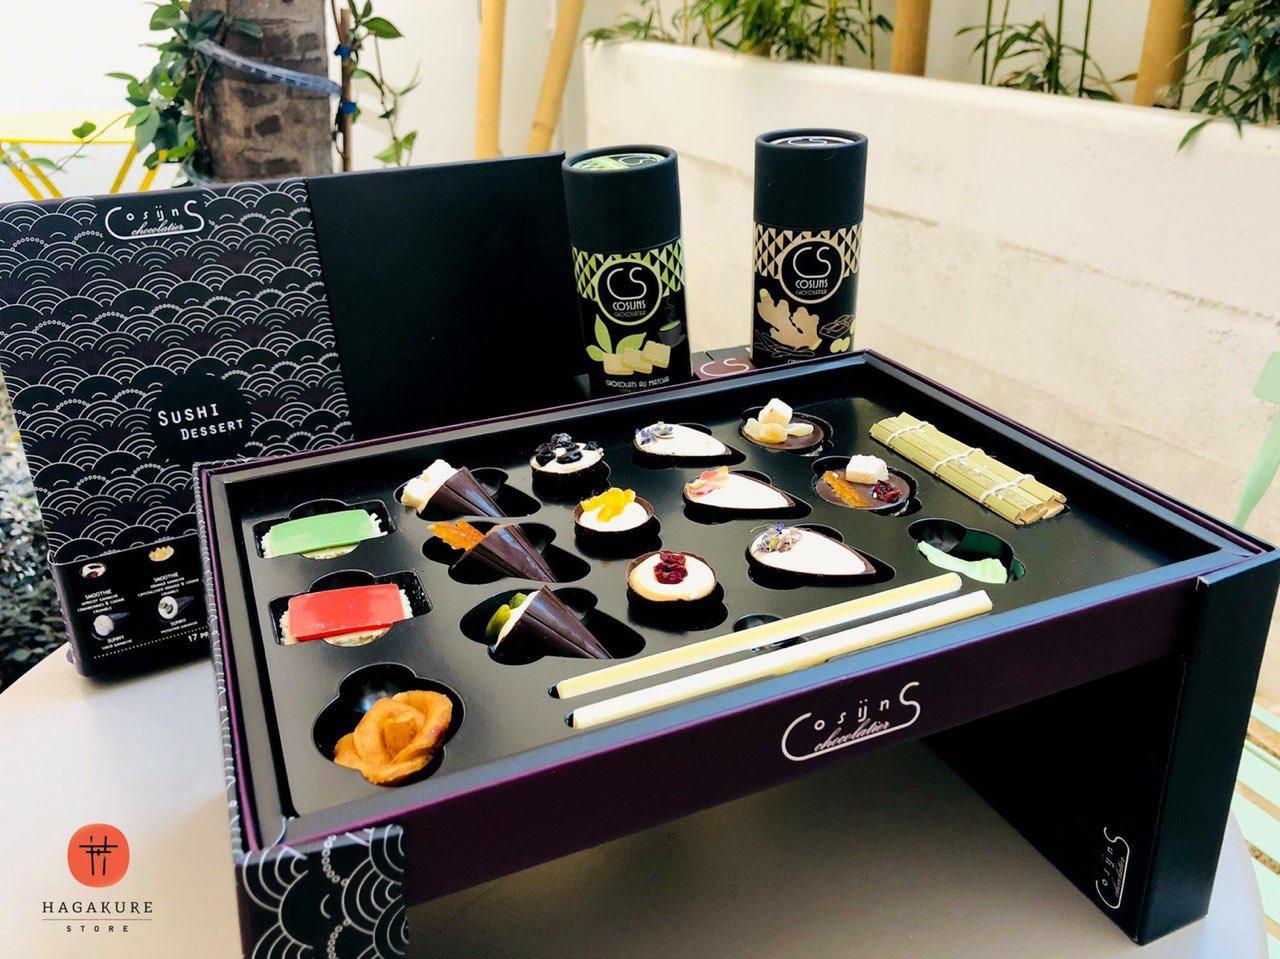 SUSHI DESSERT CHOCOLATE